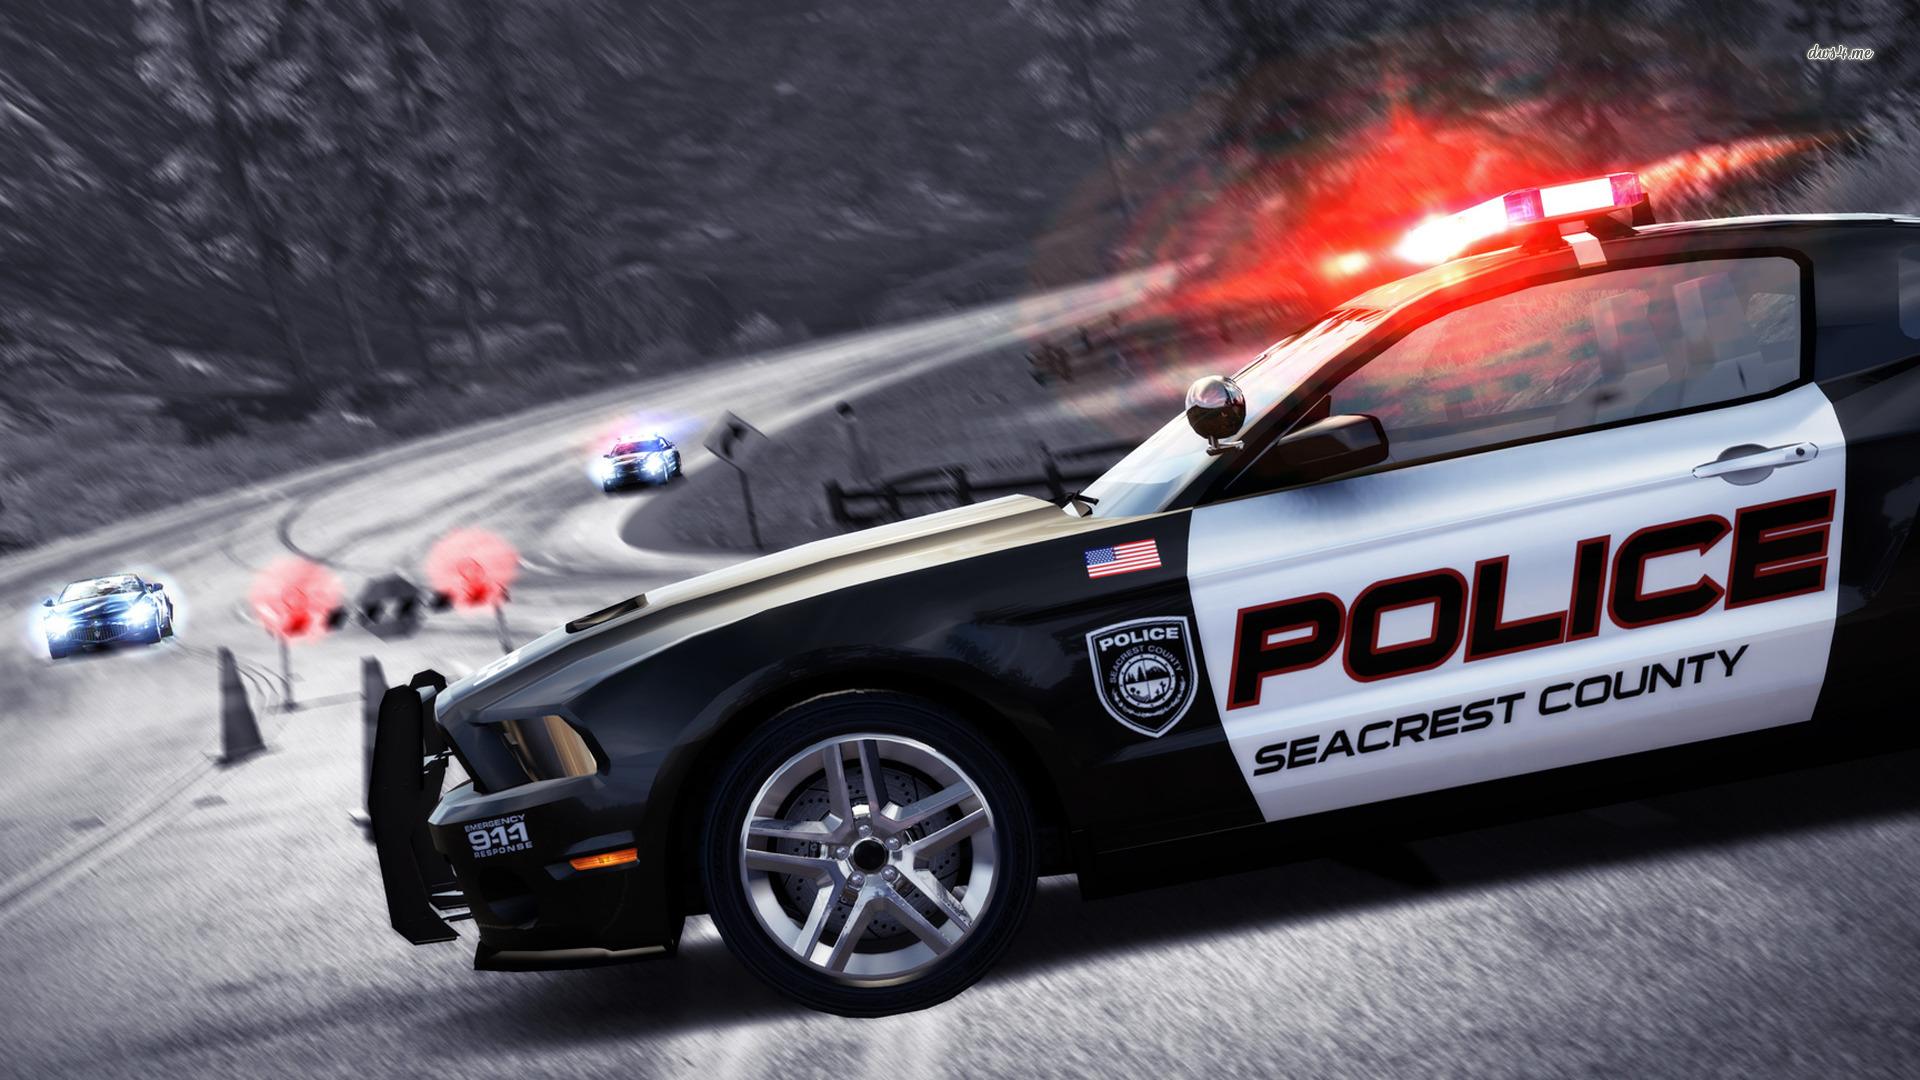 Pics photos police background police background police background - Police Car Wallpaper Backgrounds Wallpapersafari